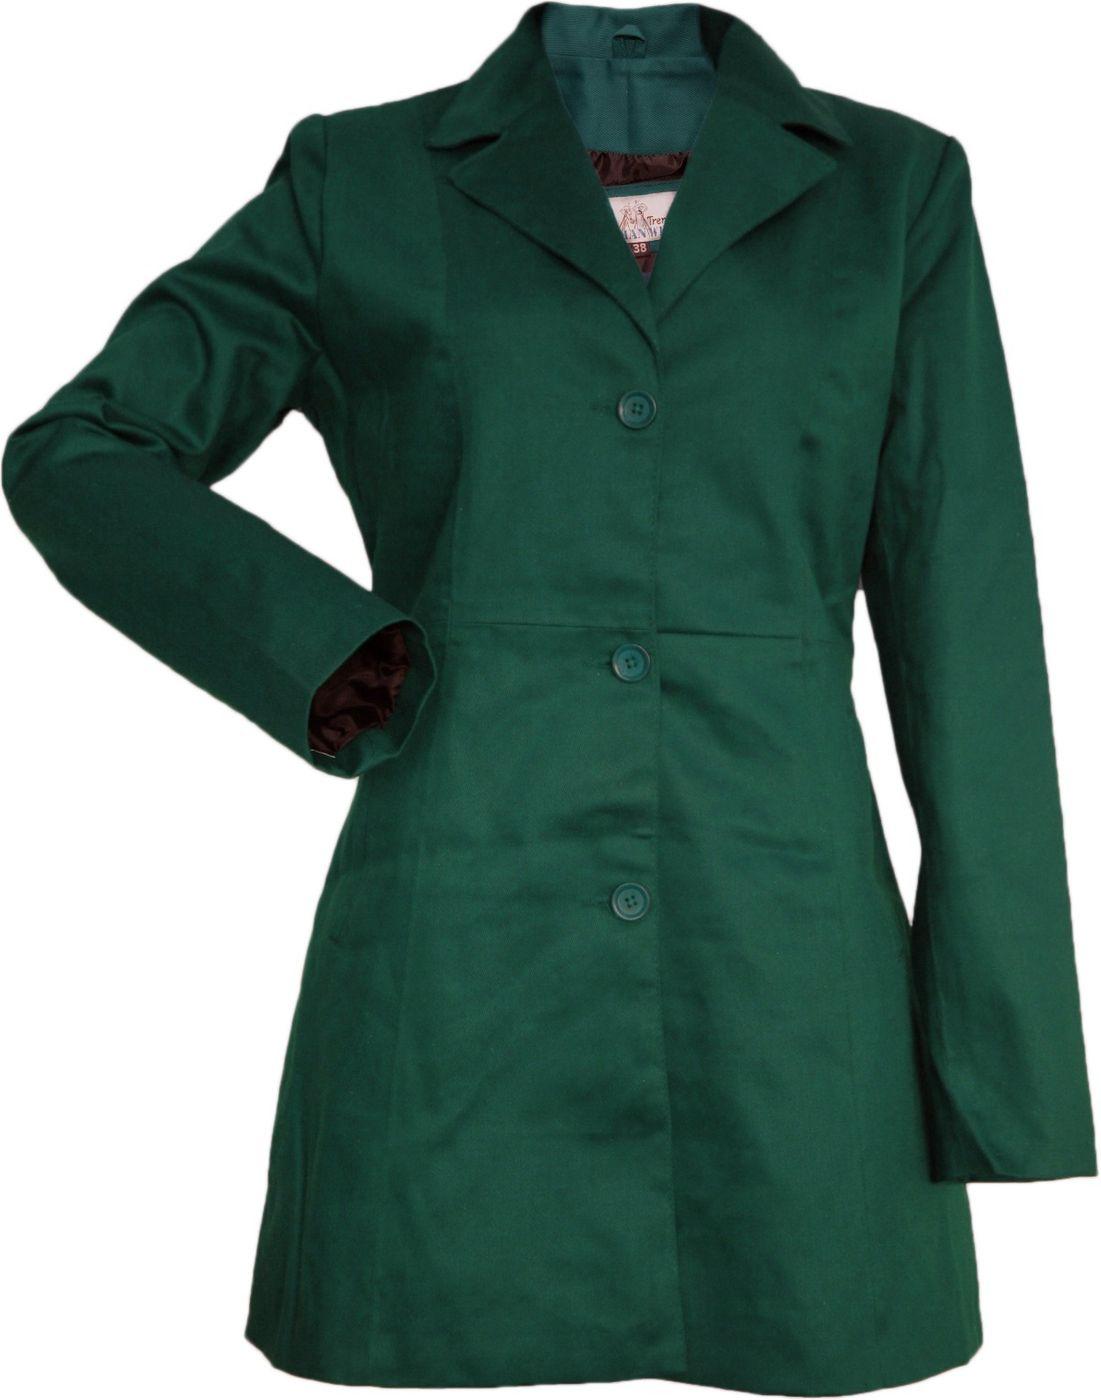 german wear damen mantel trenchcoat aus baumwolle gr n. Black Bedroom Furniture Sets. Home Design Ideas